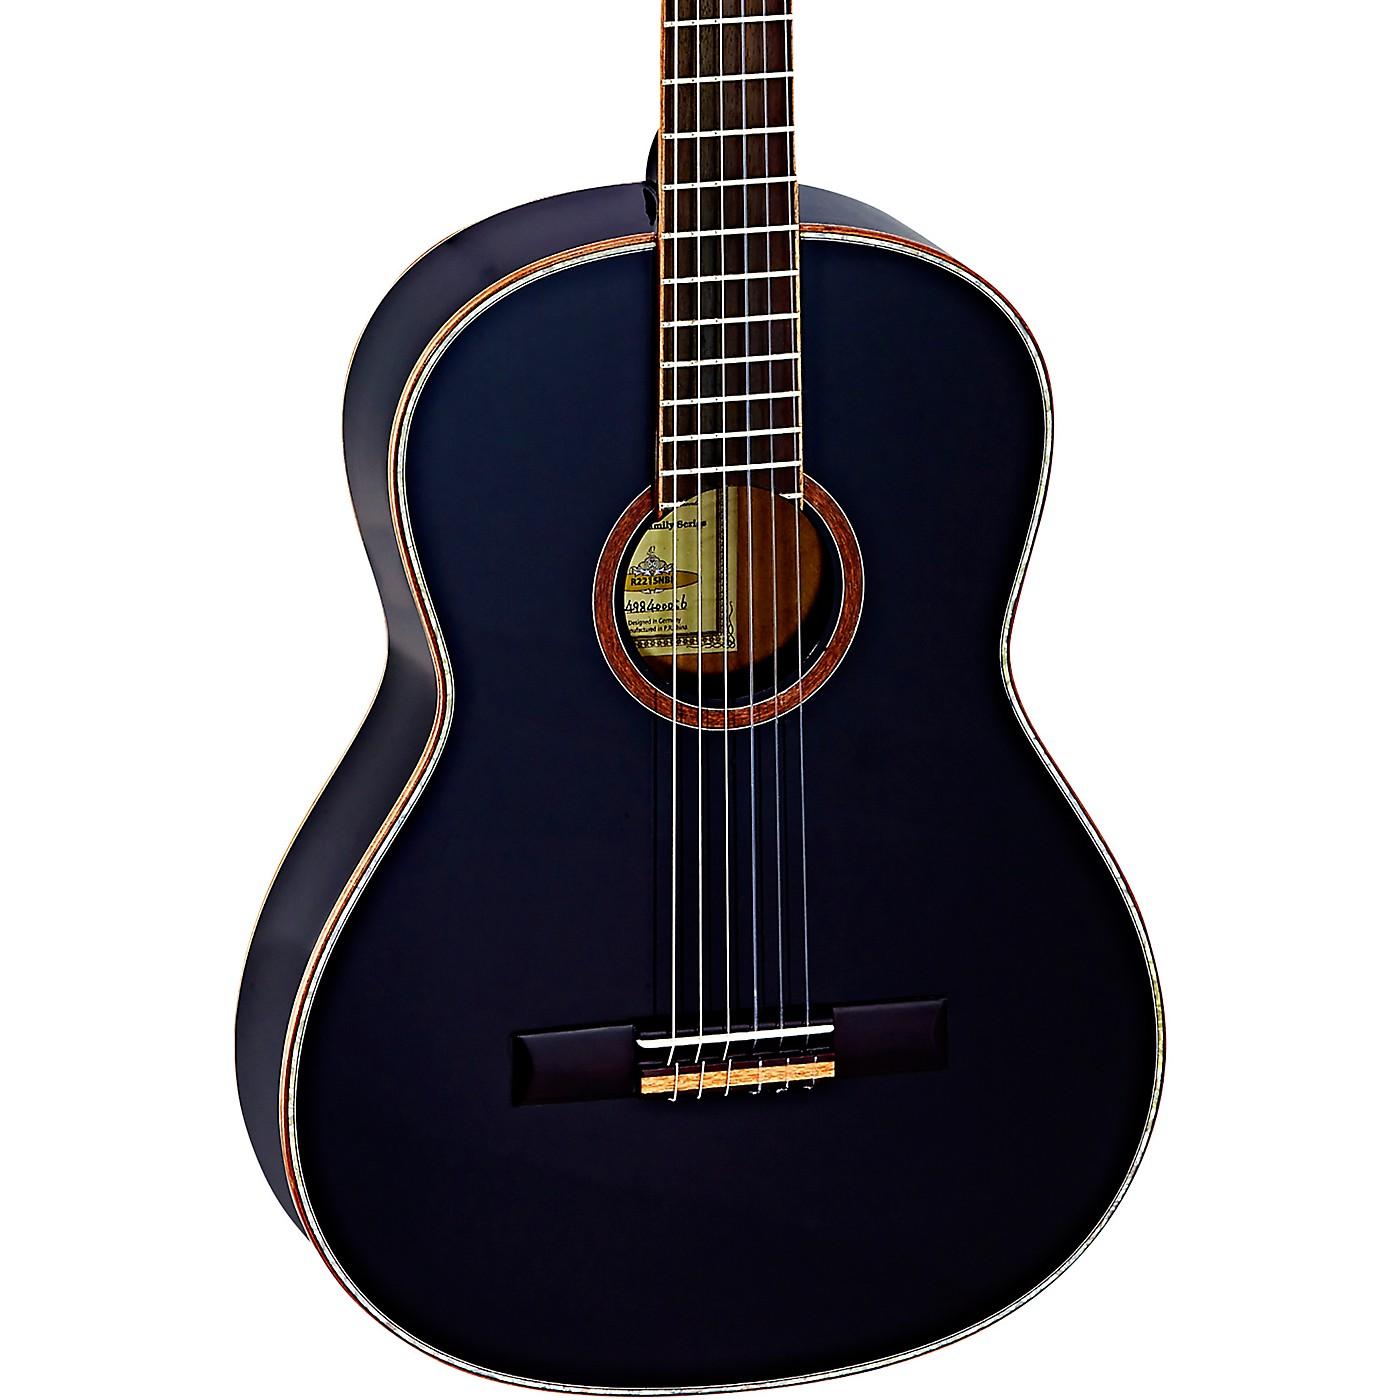 Ortega Family Series R221SNBK Slim Neck Classical Guitar thumbnail